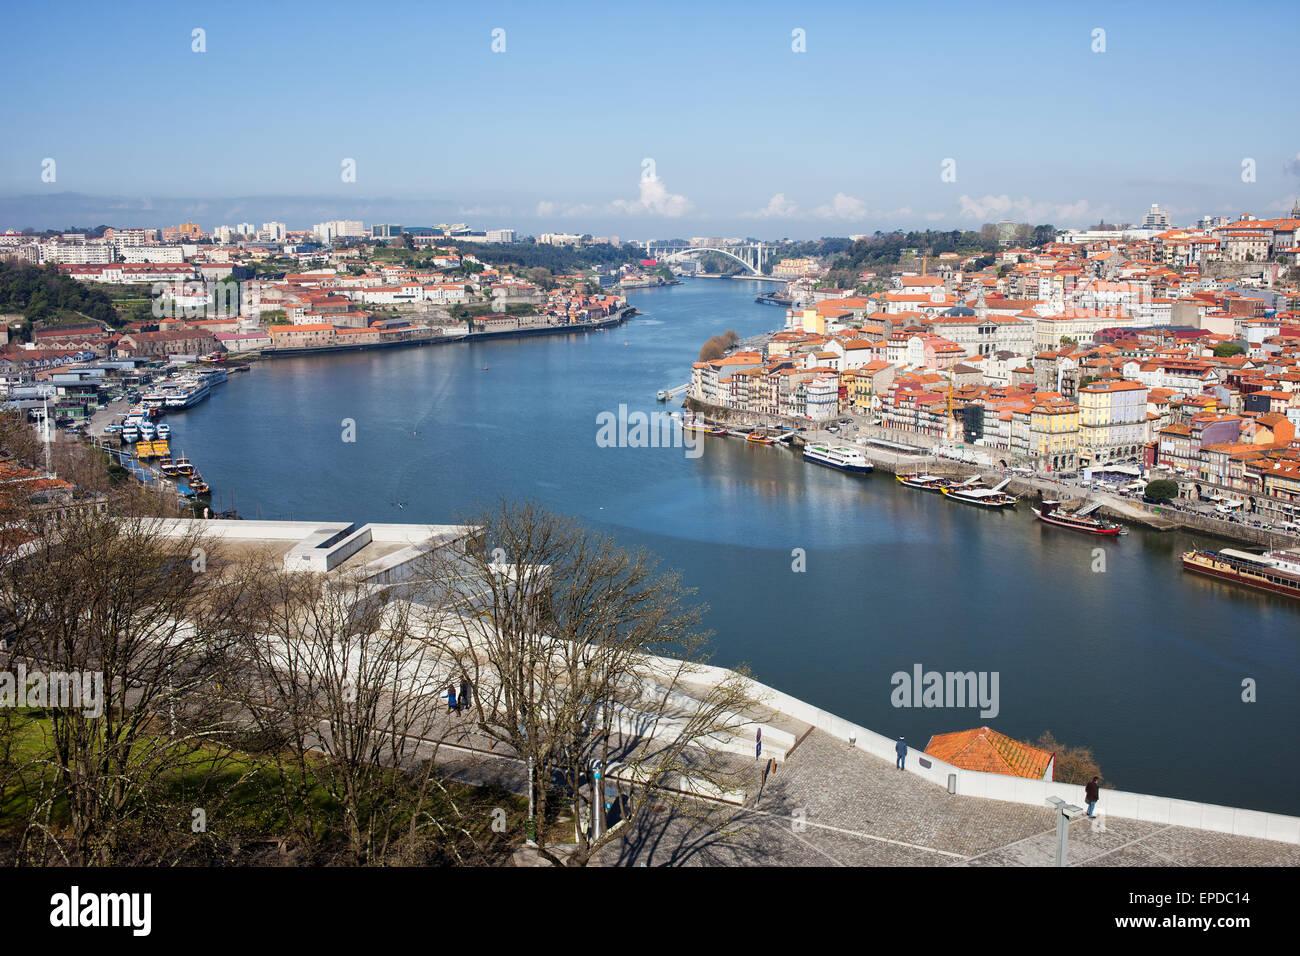 promenade porto portugal stockfotos promenade porto. Black Bedroom Furniture Sets. Home Design Ideas